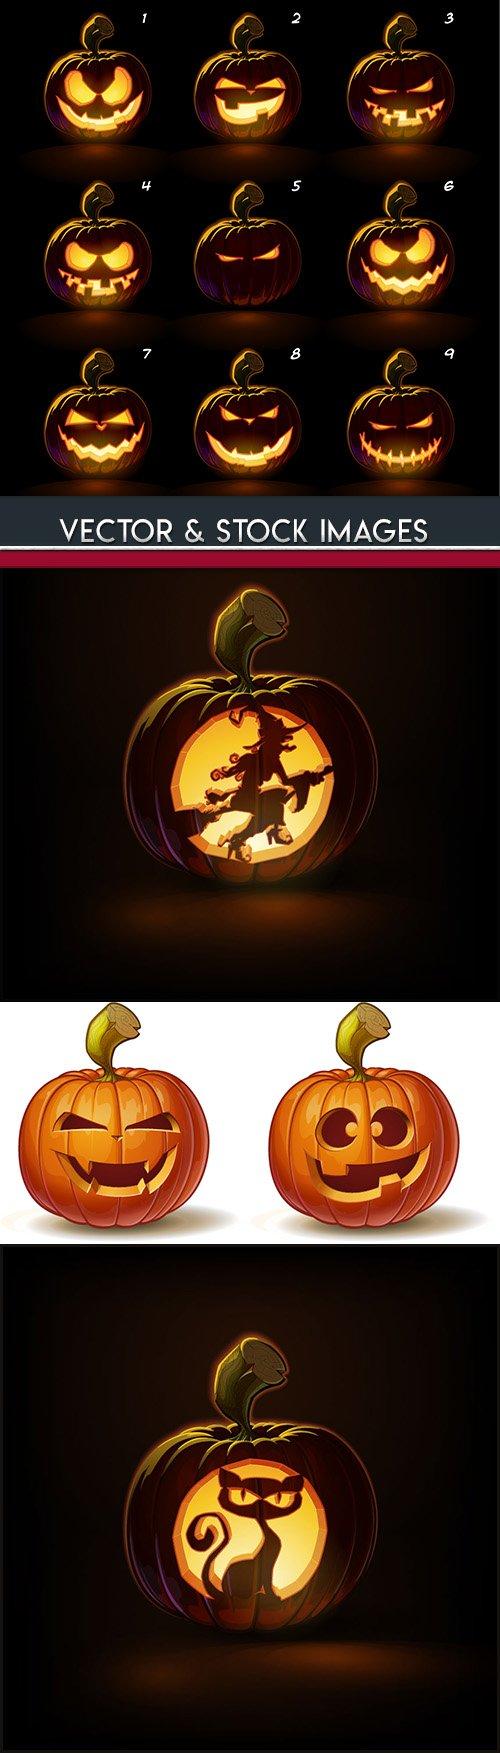 Happy Halloween pumpkin illustration collection